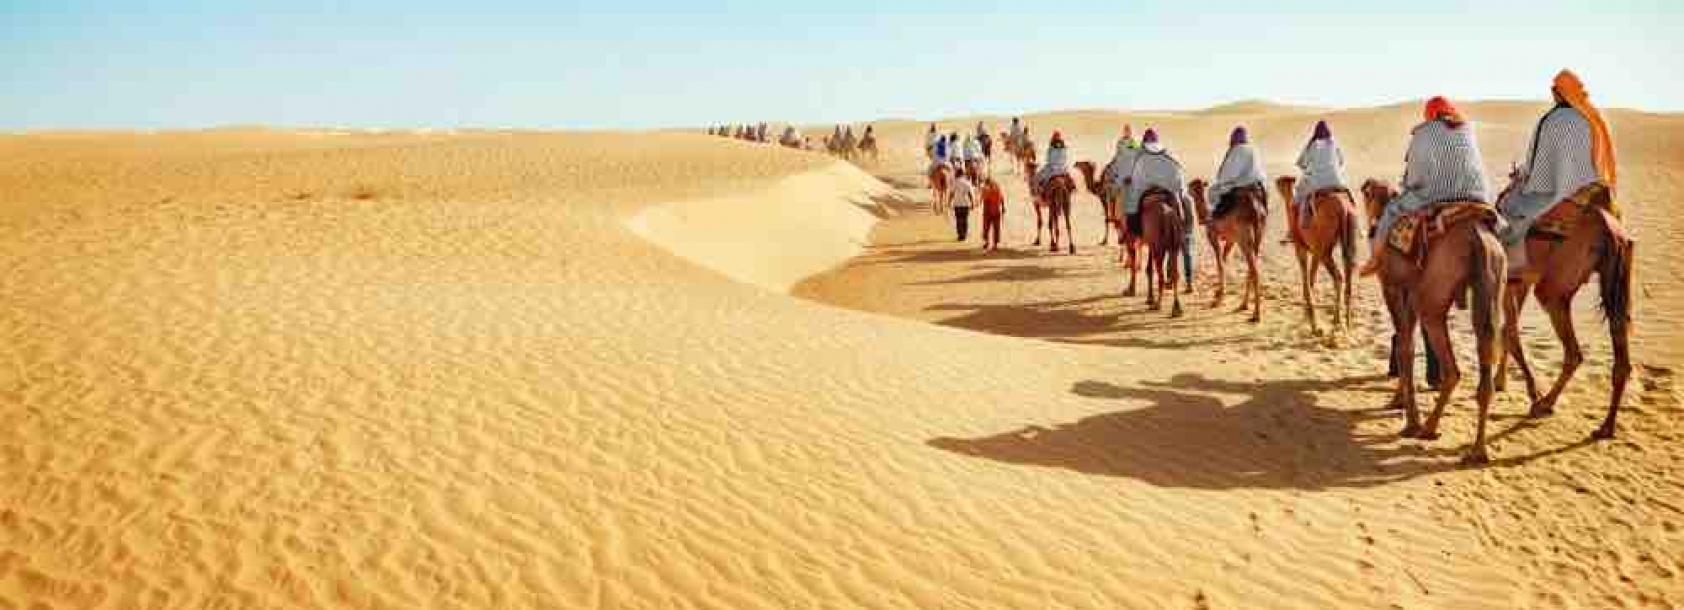 Tunisia_Sahara Desert